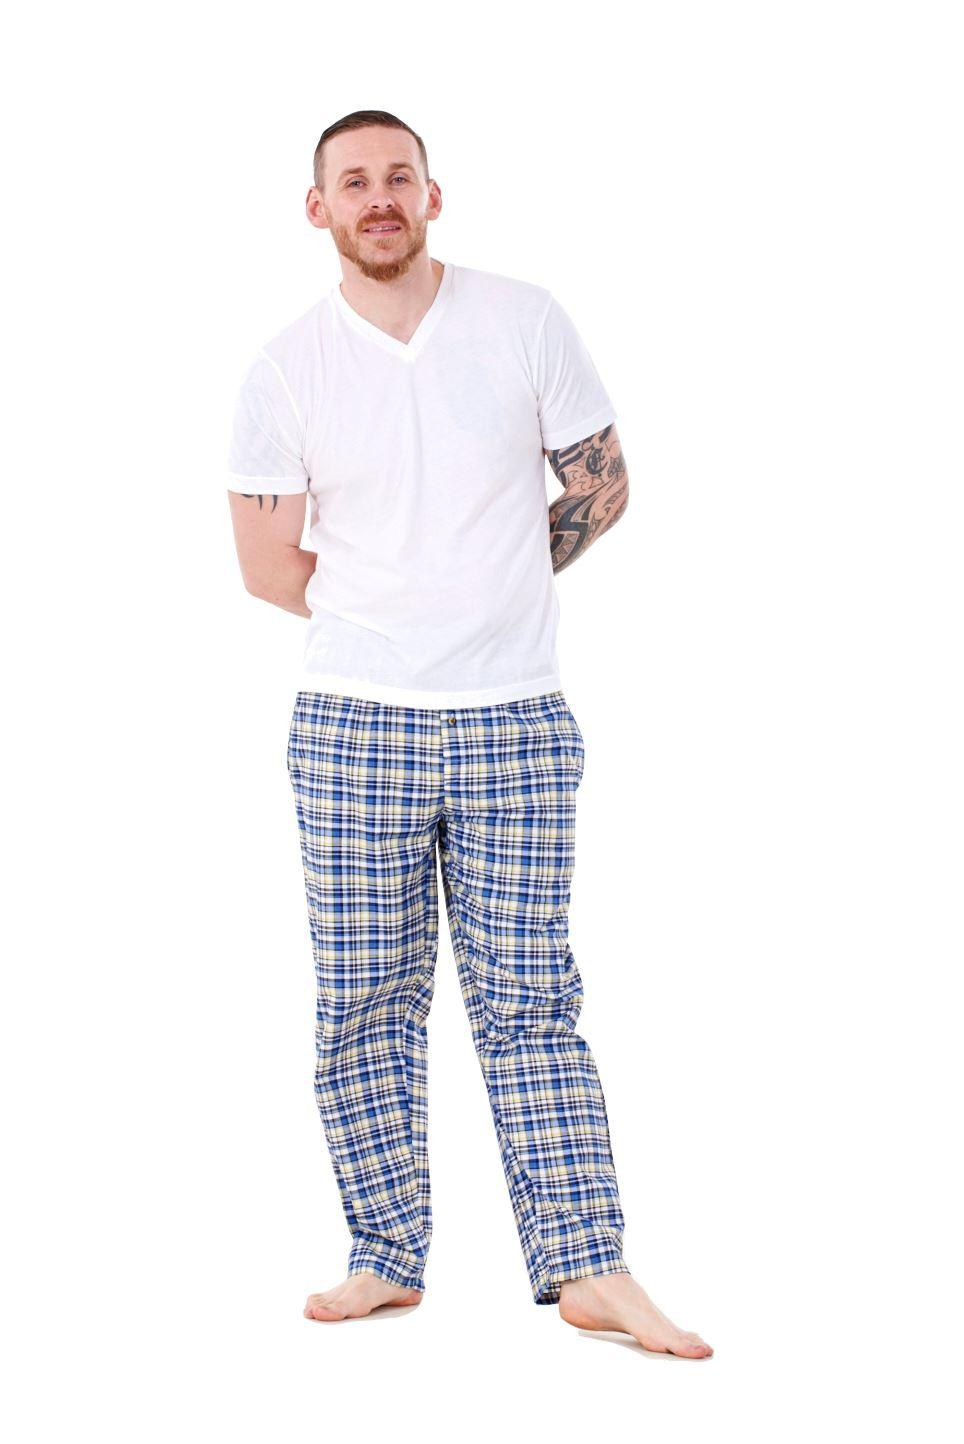 Mens-Pyjama-Bottoms-Rich-Cotton-Woven-Check-Lounge-Pant-Nightwear-Big-3XL-to-5XL Indexbild 21